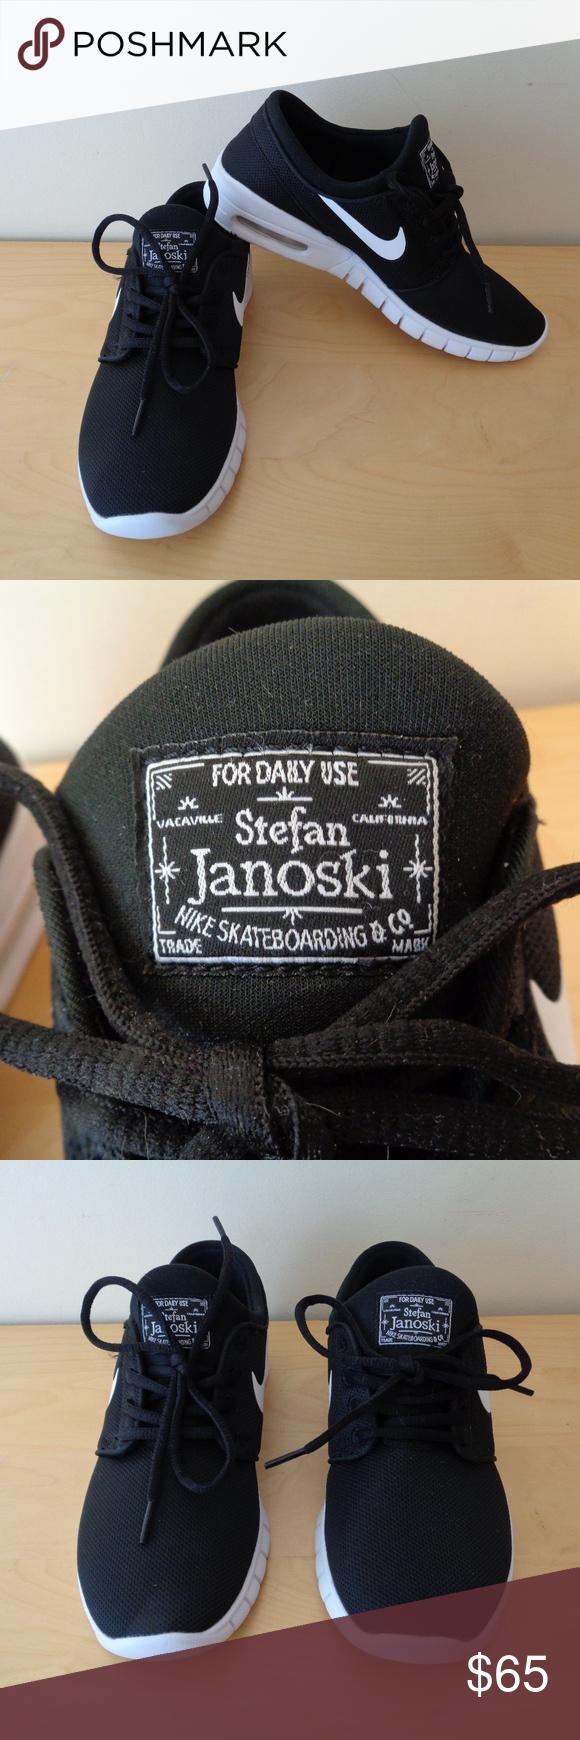 eaeb80a87b Nike Youth SB Stefan Janoski Max Sneakers NEW NEW Nike Youth Size 7 SB  Stefan Janoski Max Big Kids Black Skateboarding Sneakers Retail $95 New  without Box ...